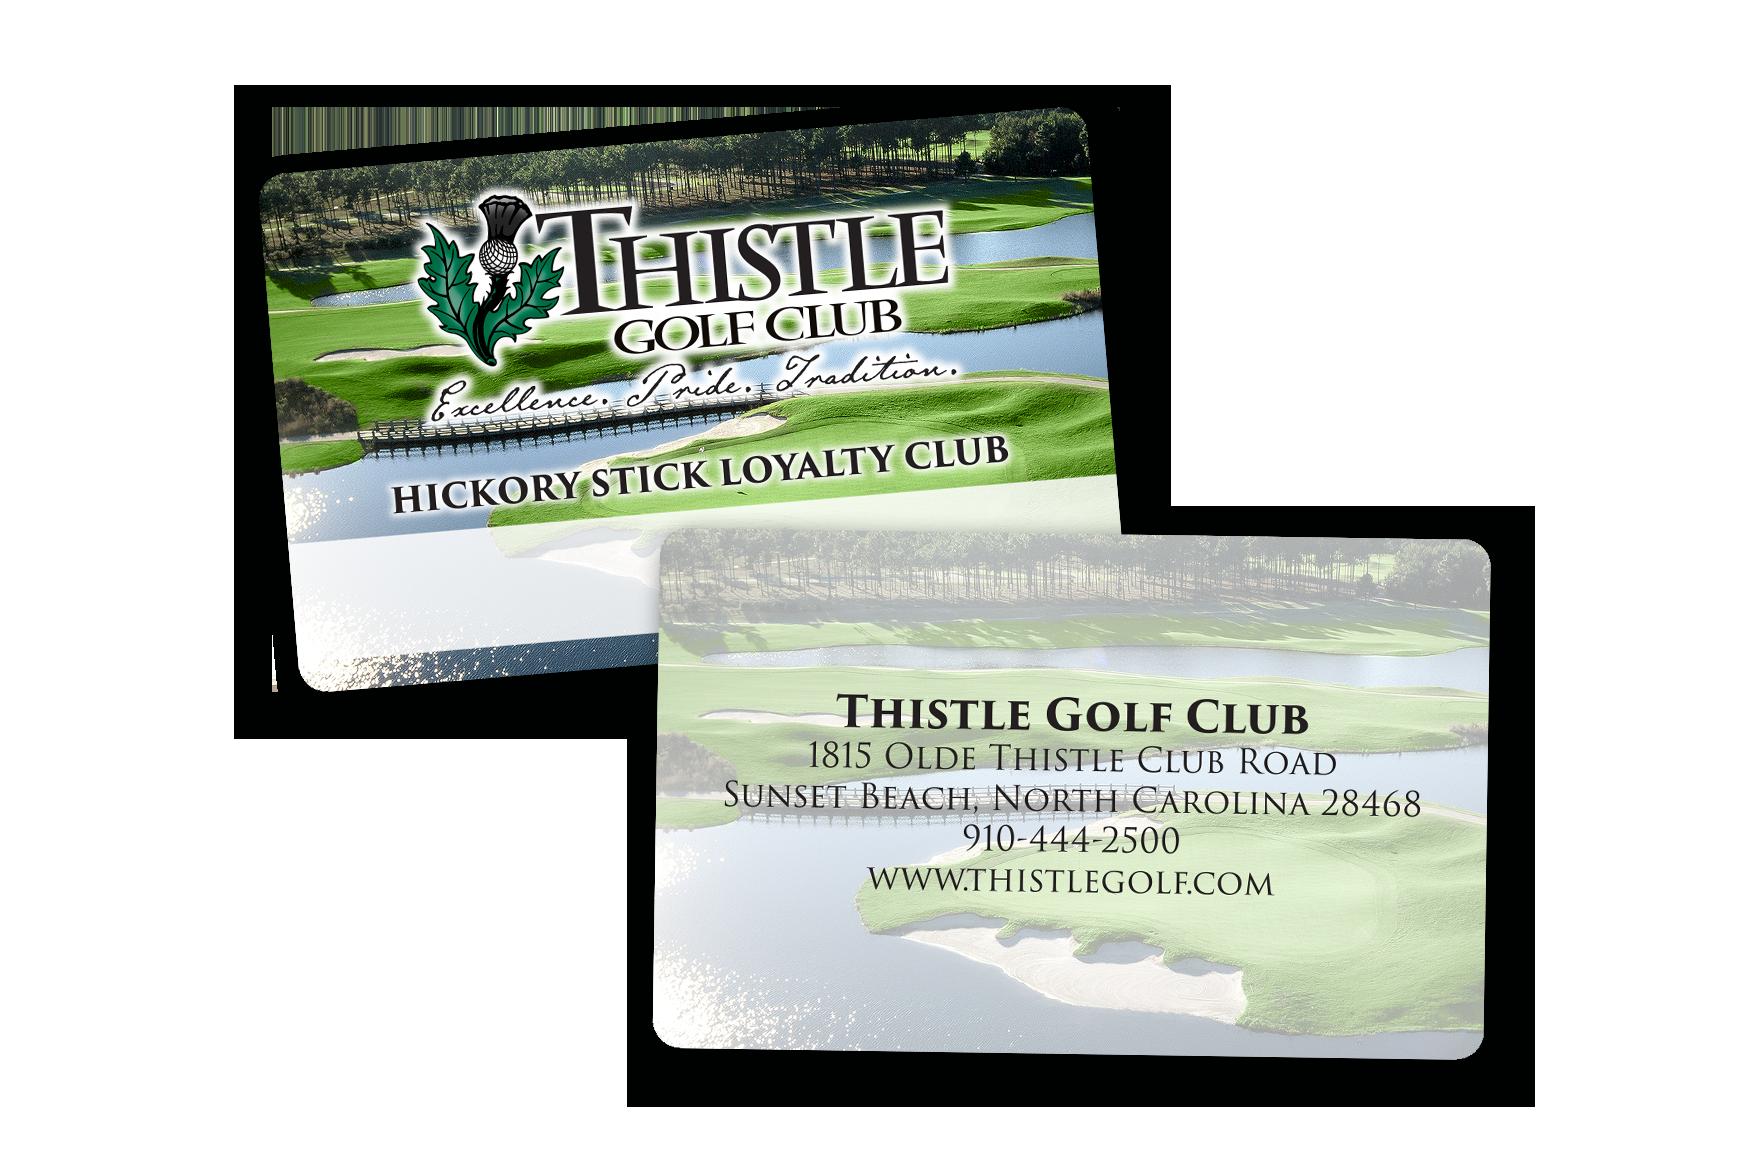 Golf Course Loyalty Programs